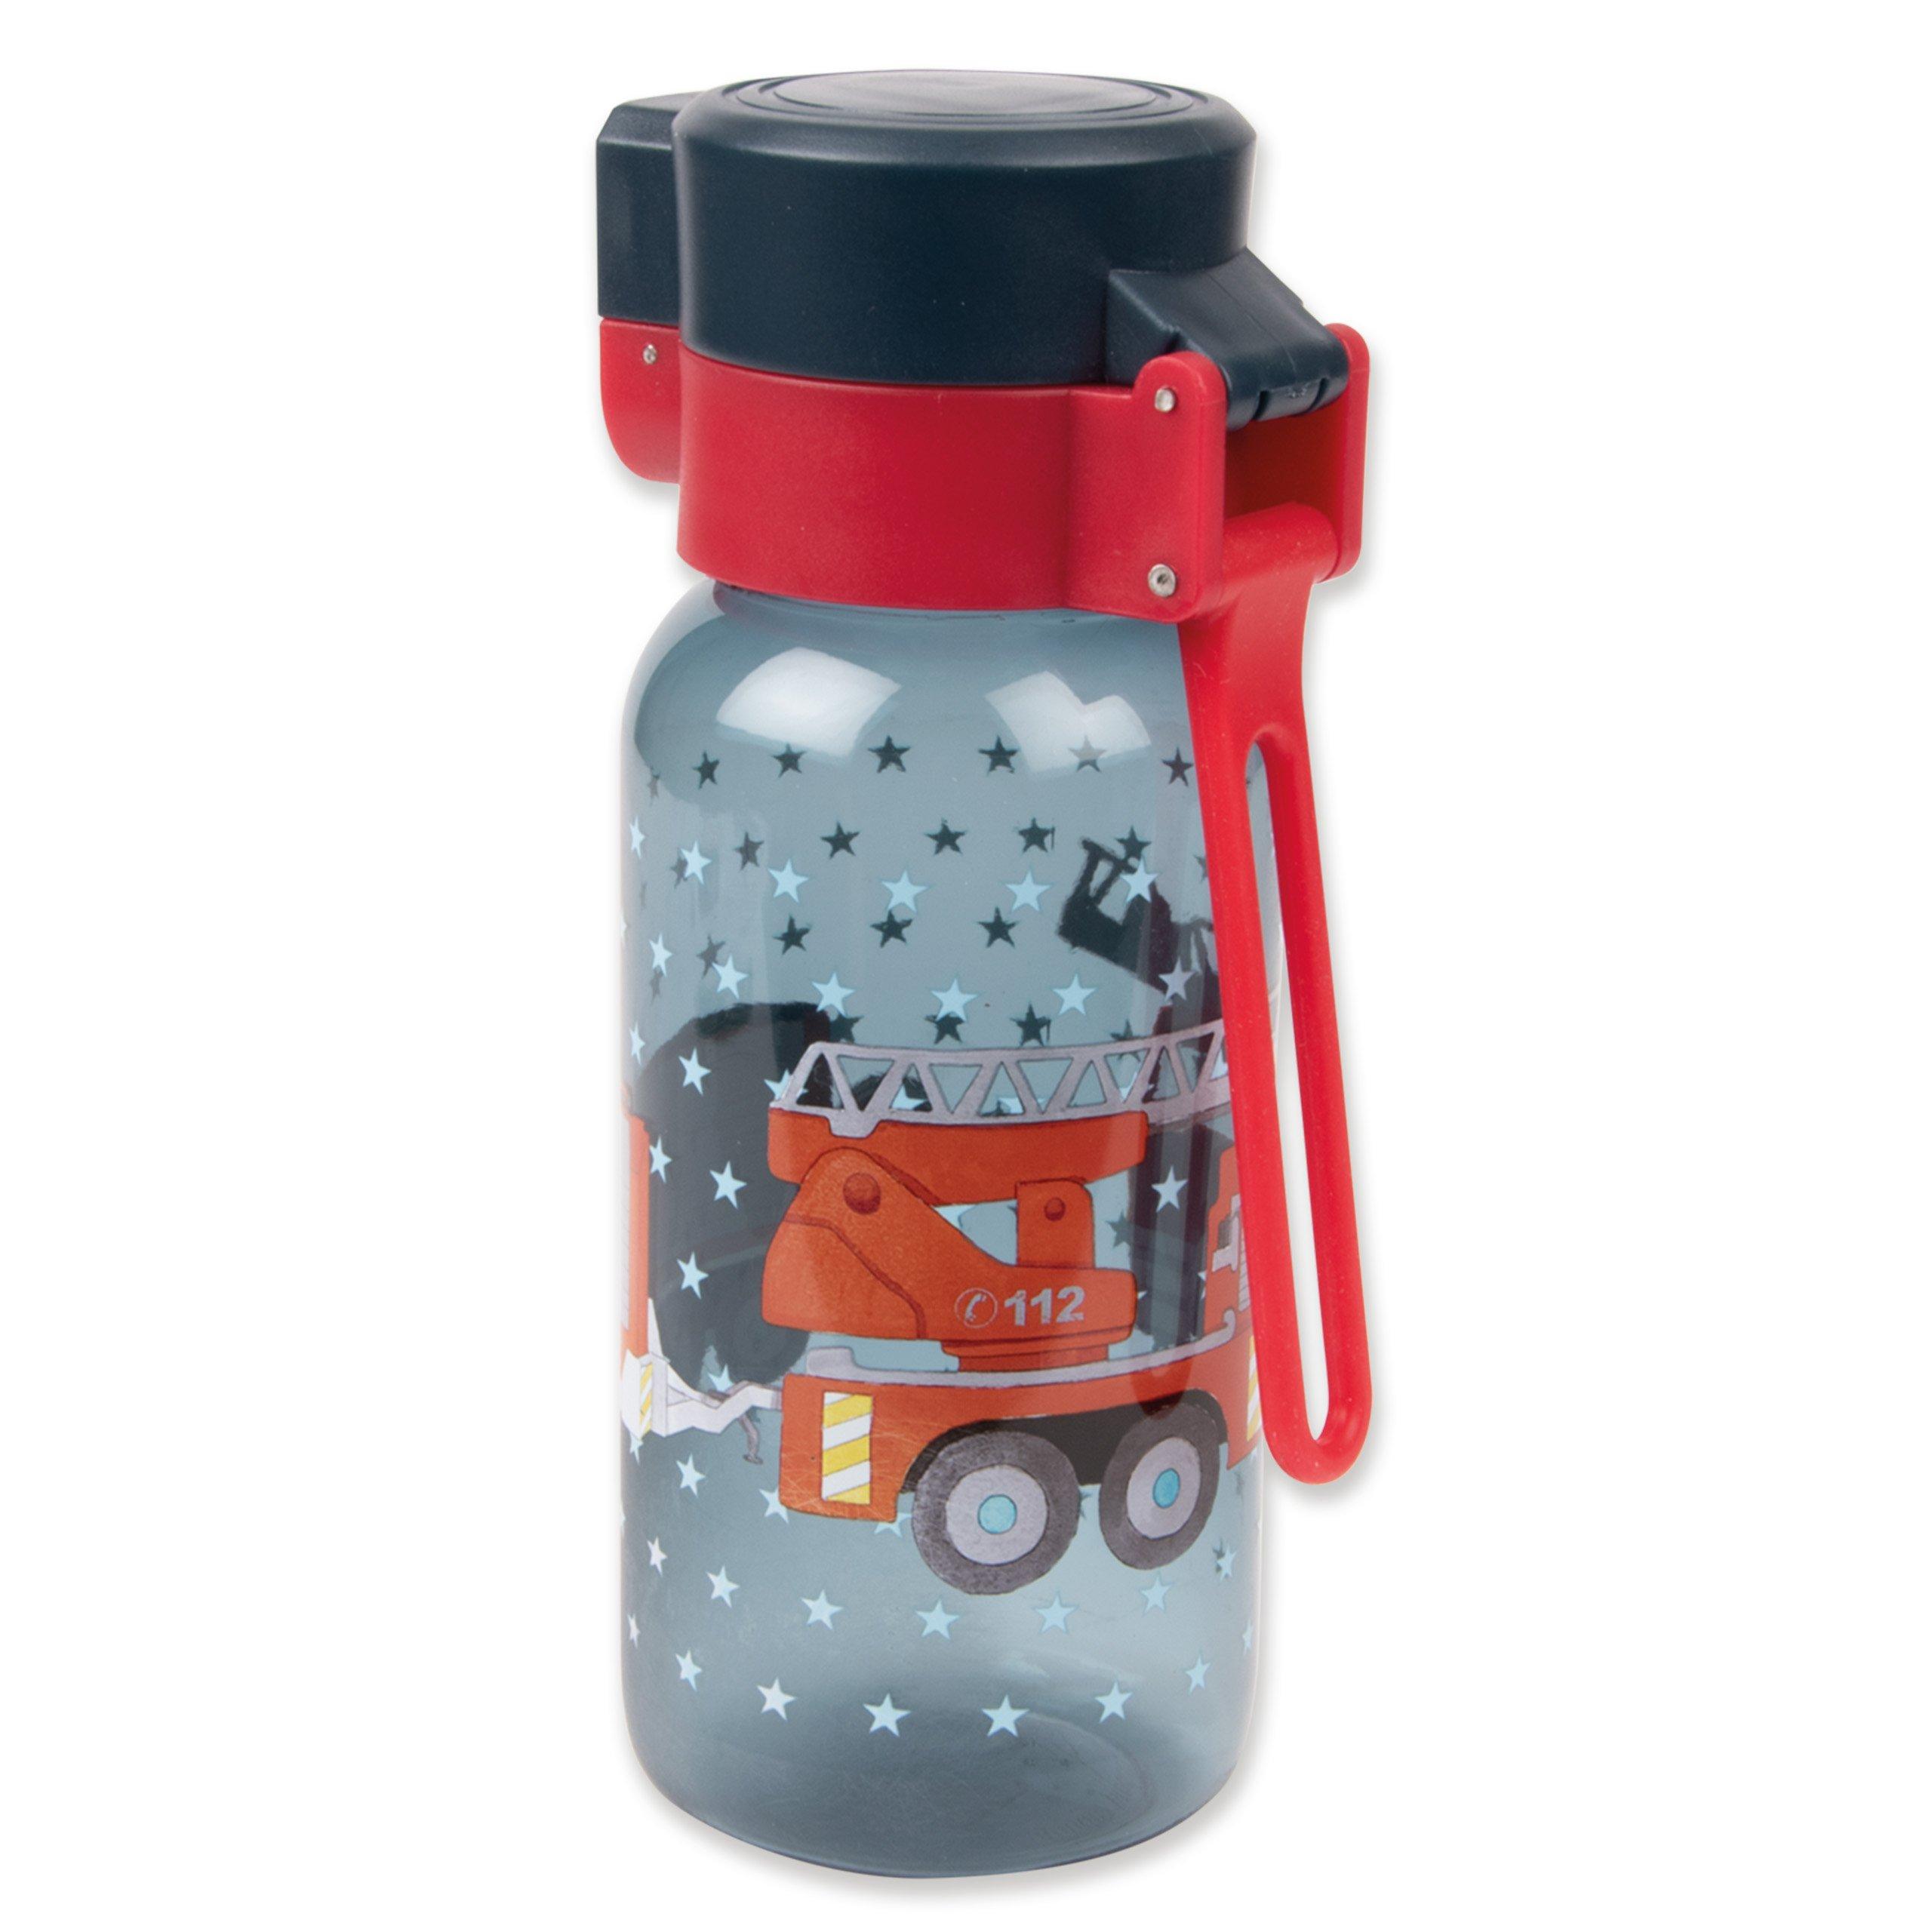 Drikkeflaske med navn - Brandbil